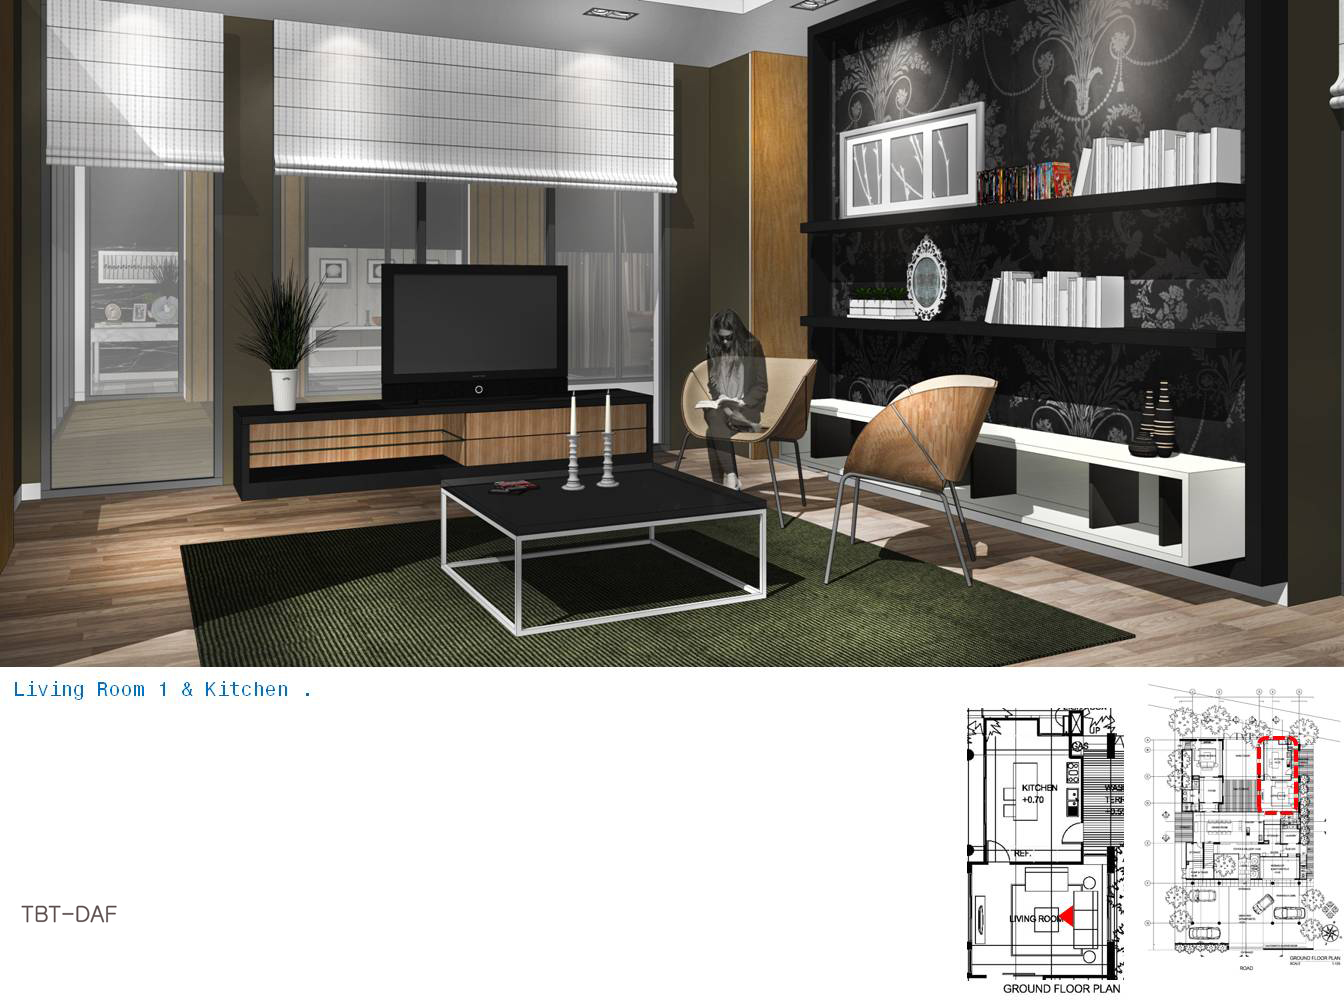 TBT-DAF interior design house robinson 8